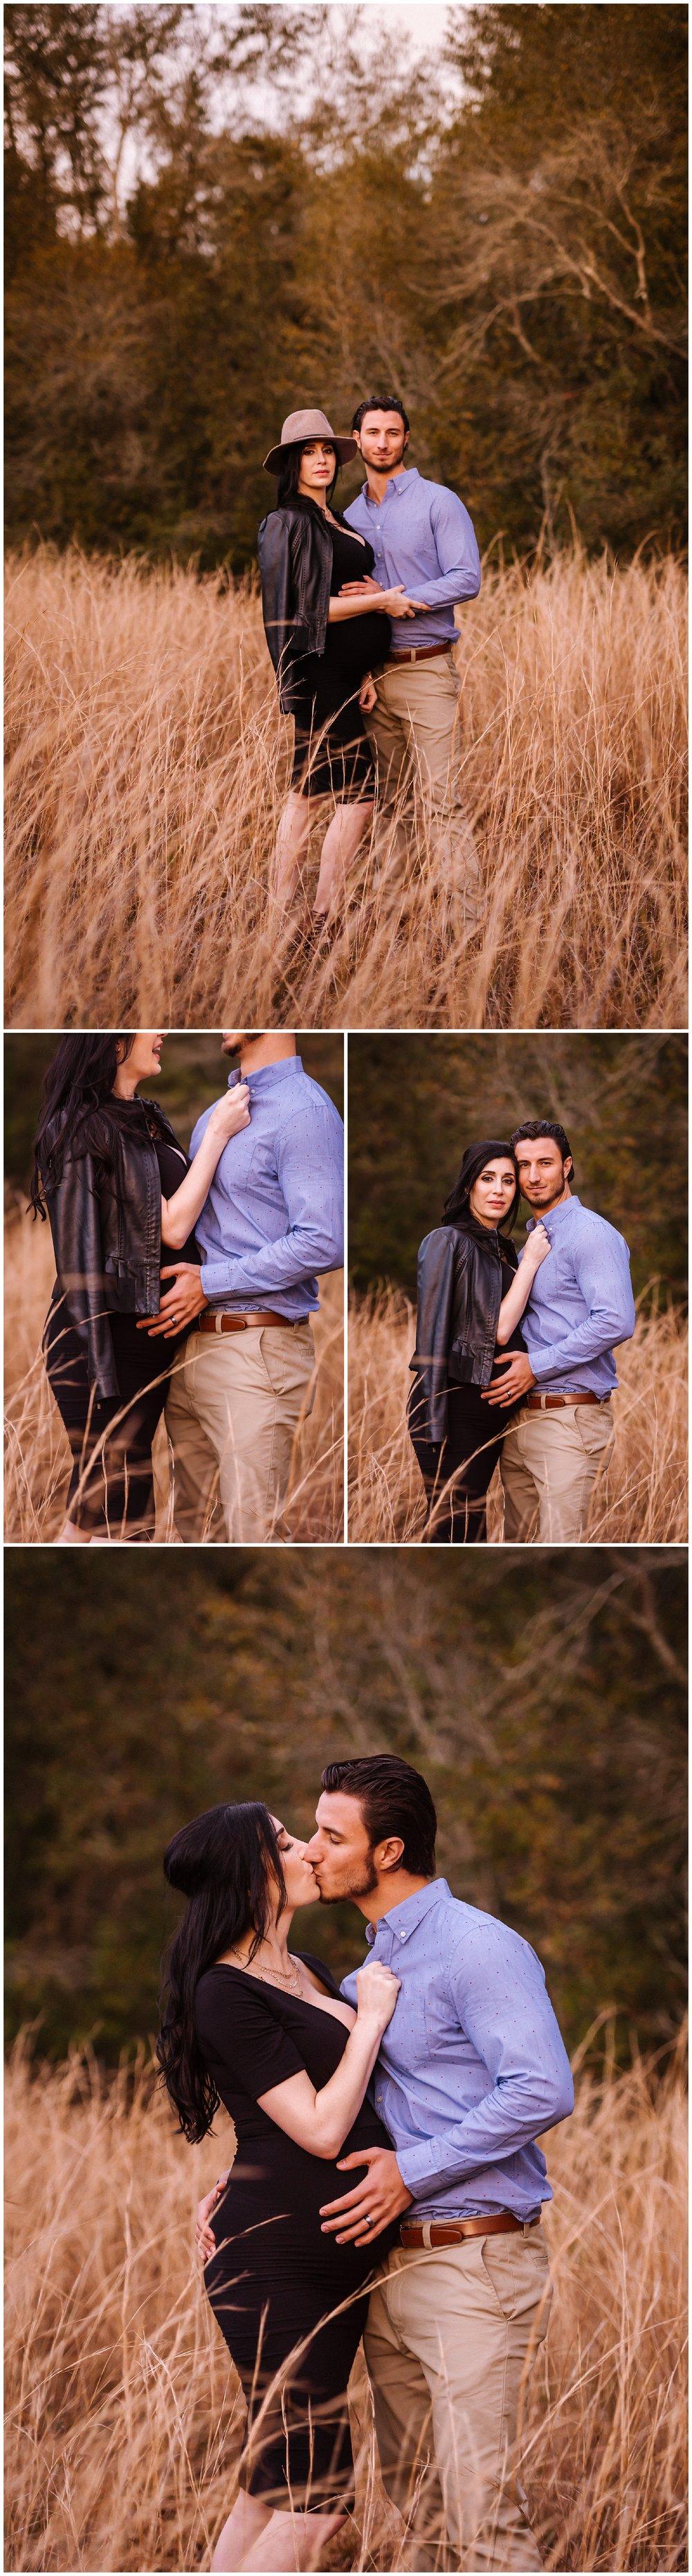 Tampa-maternity-photographer-morris-bridge-park-hip-tight-black-dress-woods_0022.jpg